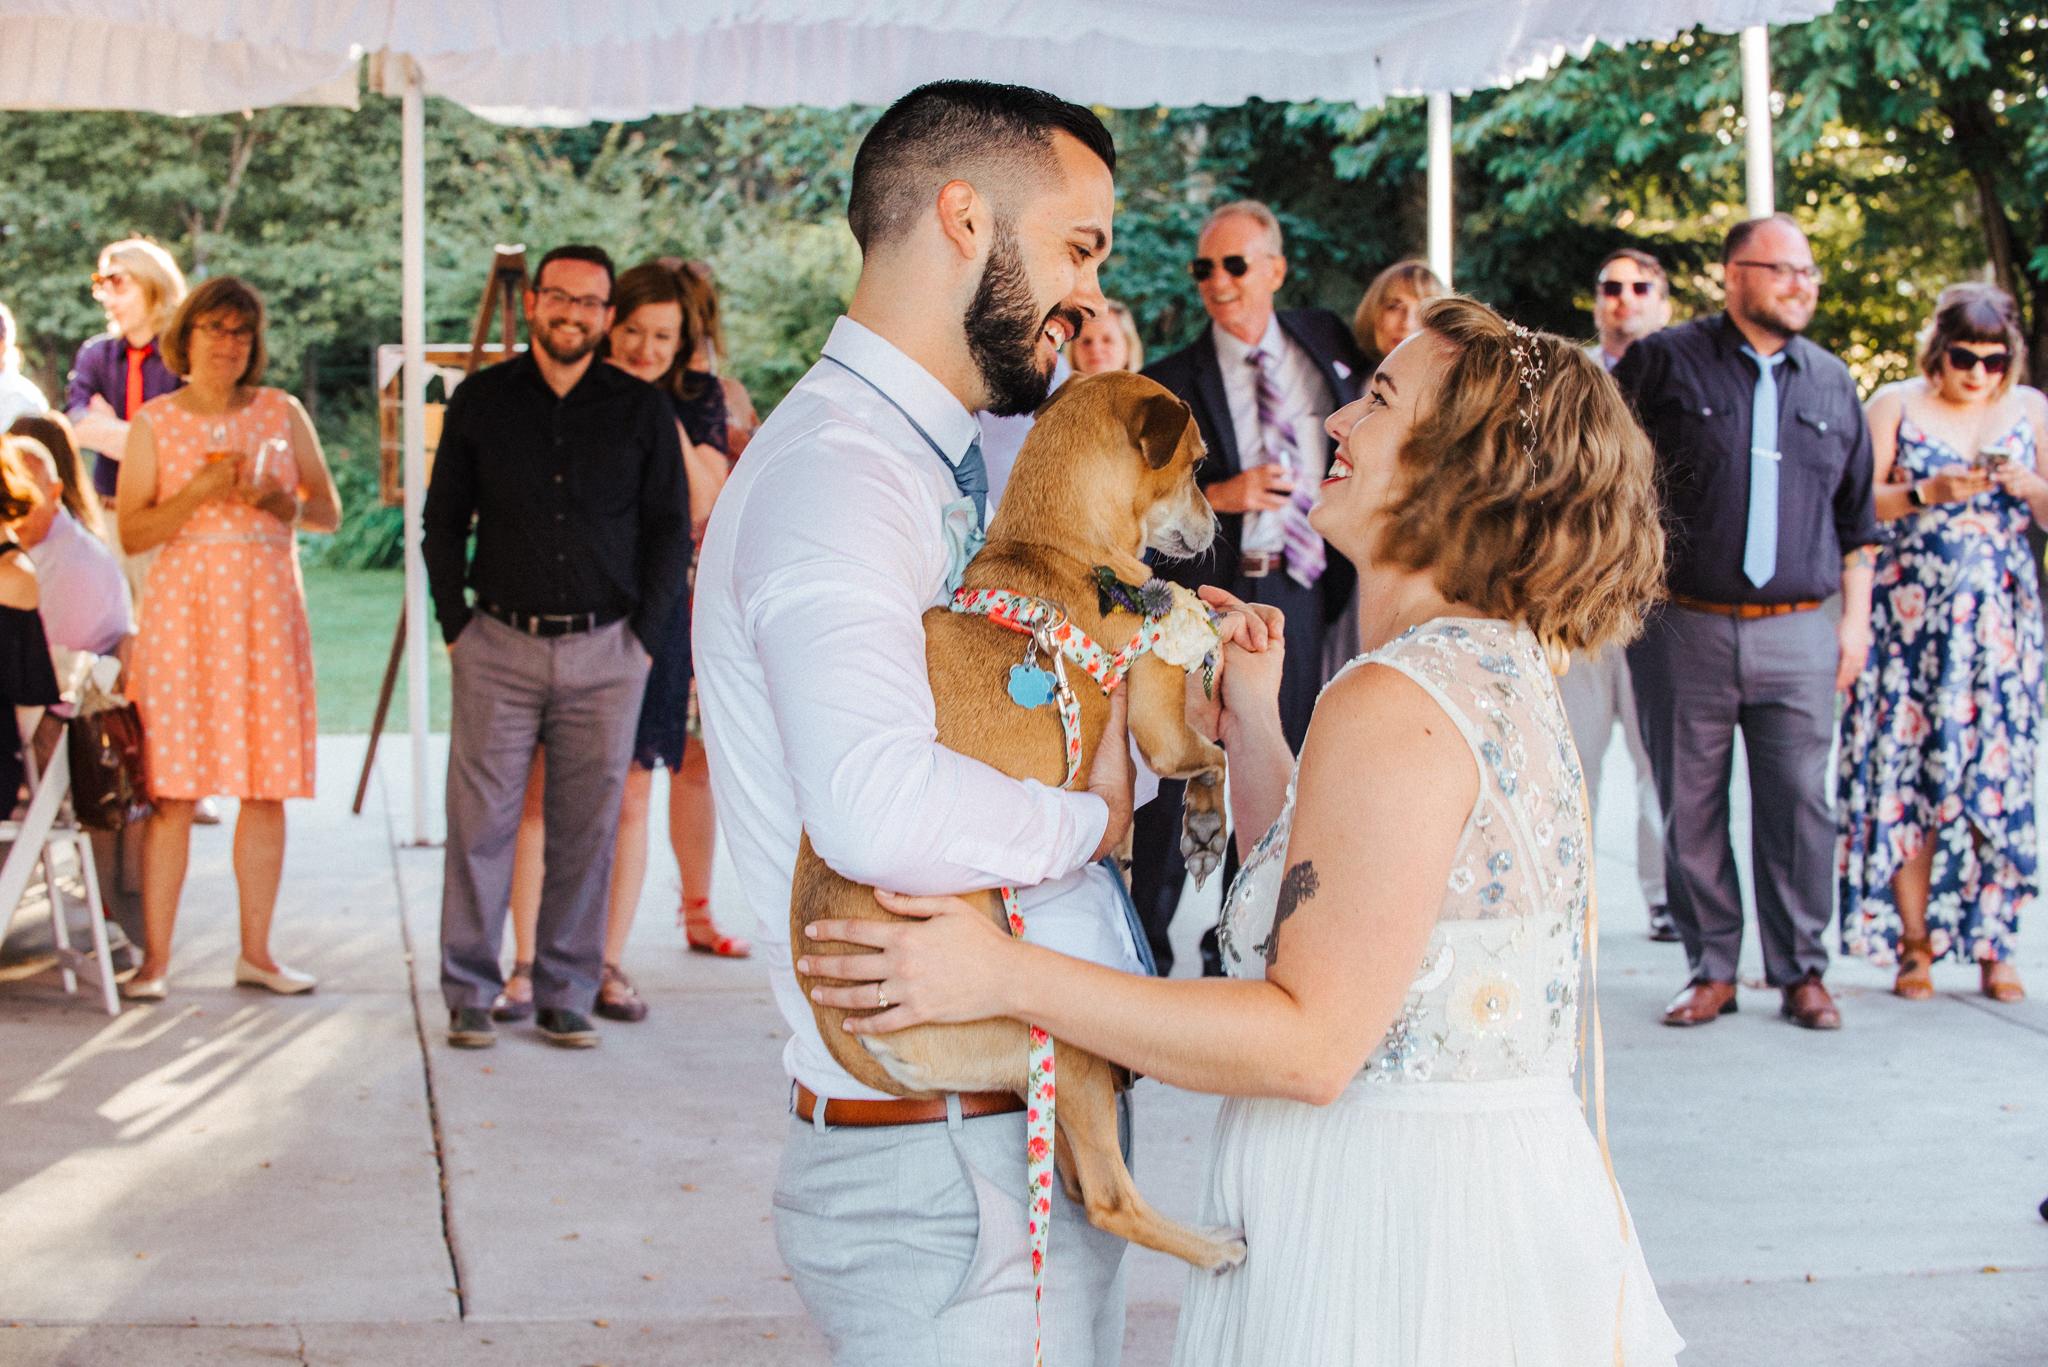 Amy Steven Seattle Wedding Photographer Vishal Goklani_051.jpg